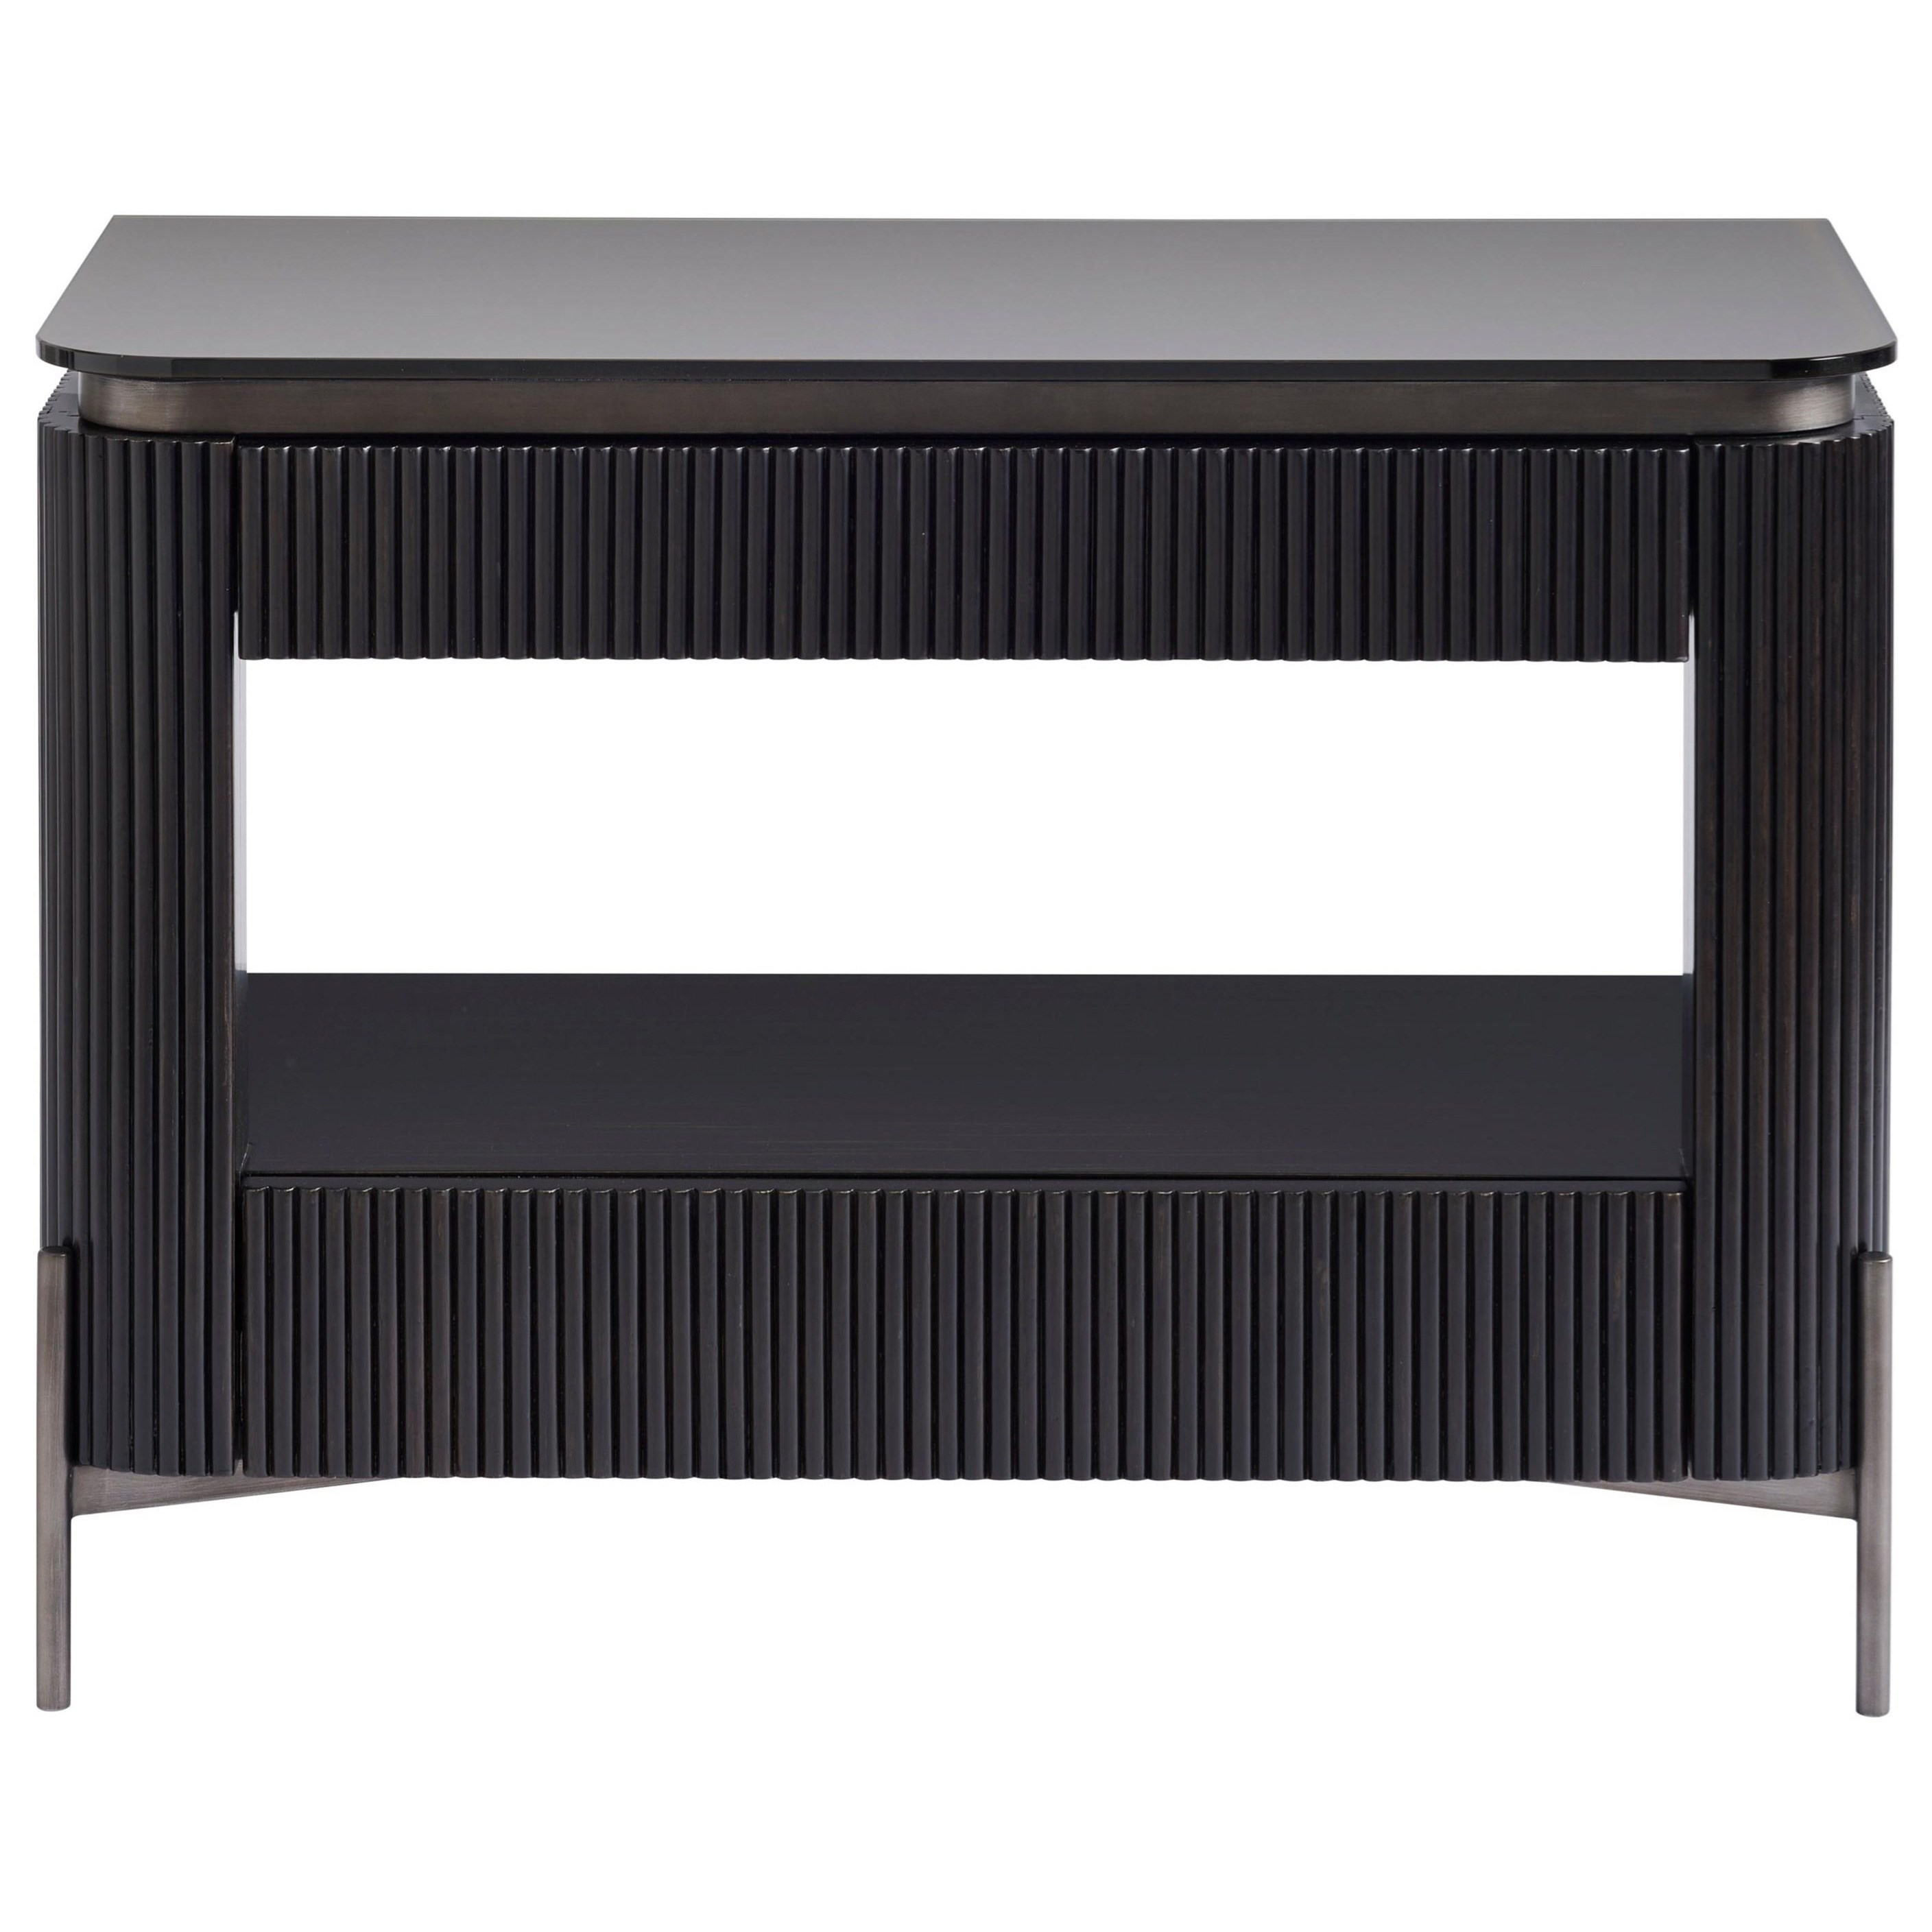 Nina Magon 941 Iris Nightstand by Universal at Baer's Furniture